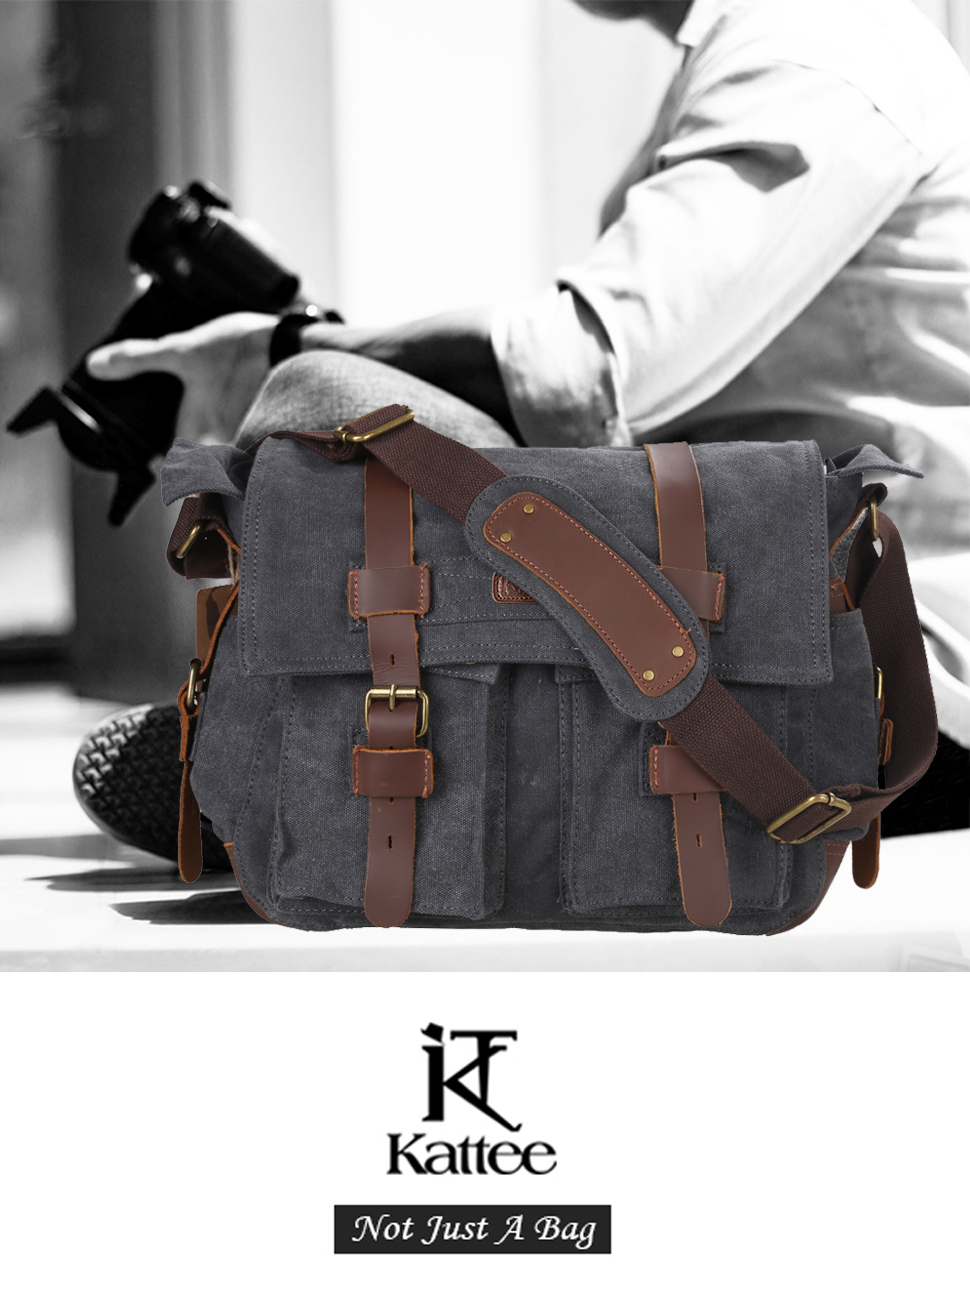 4dfee317559d Amazon.com  Kattee Leather Canvas Camera Bag Vintage DSLR SLR ...